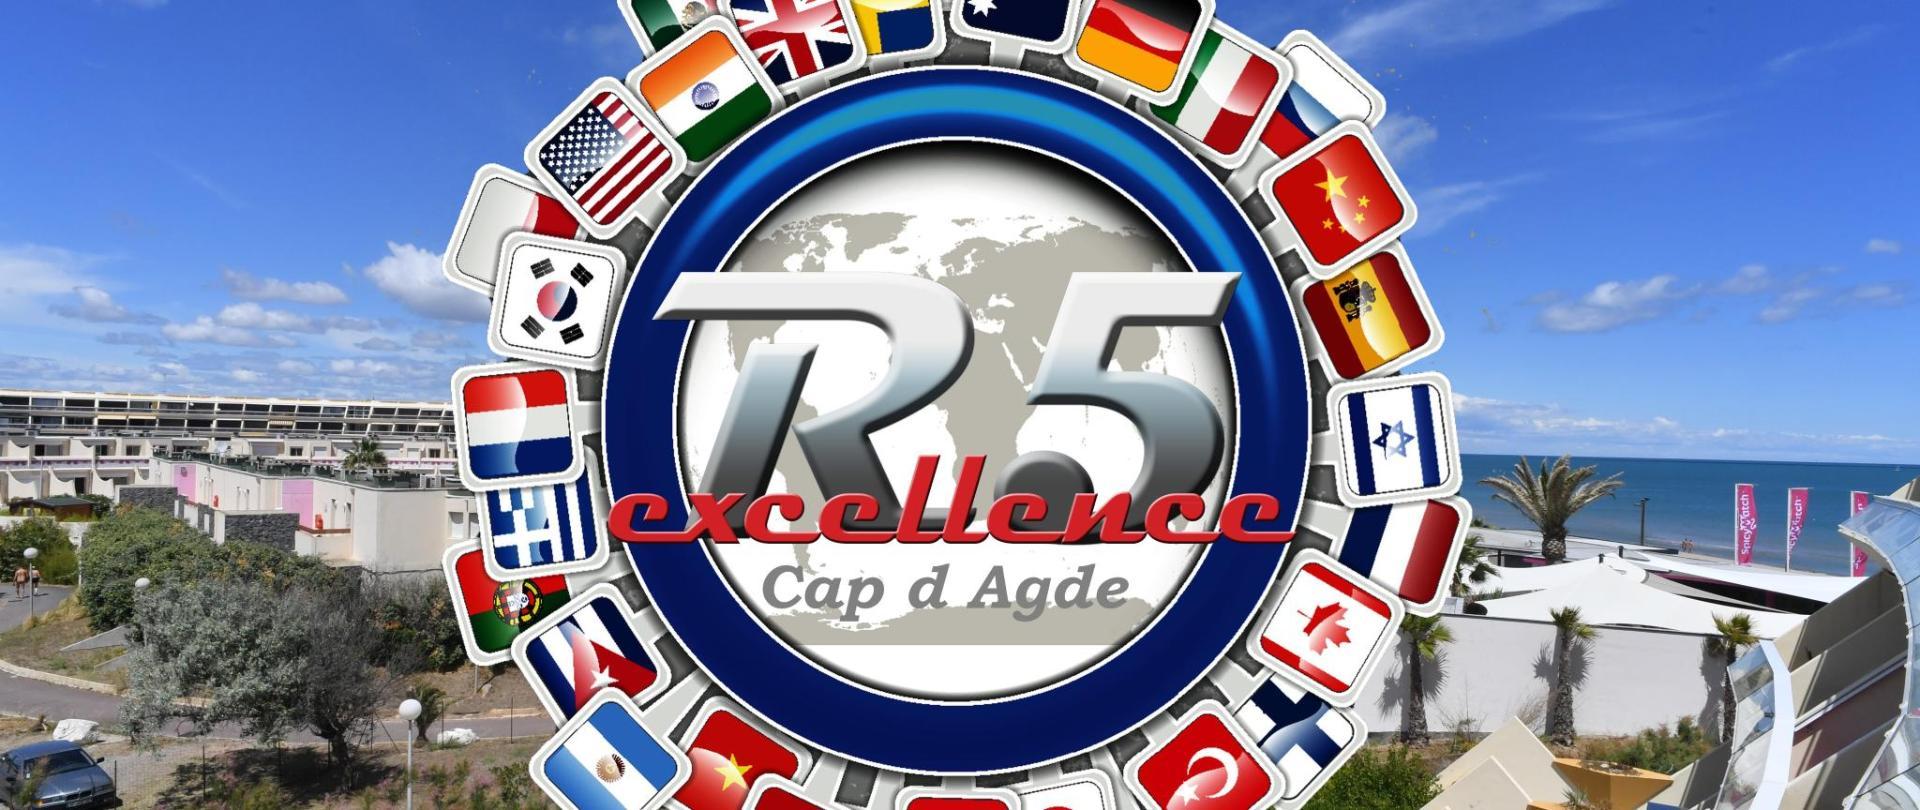 R5 eXcellence Cap d Agde